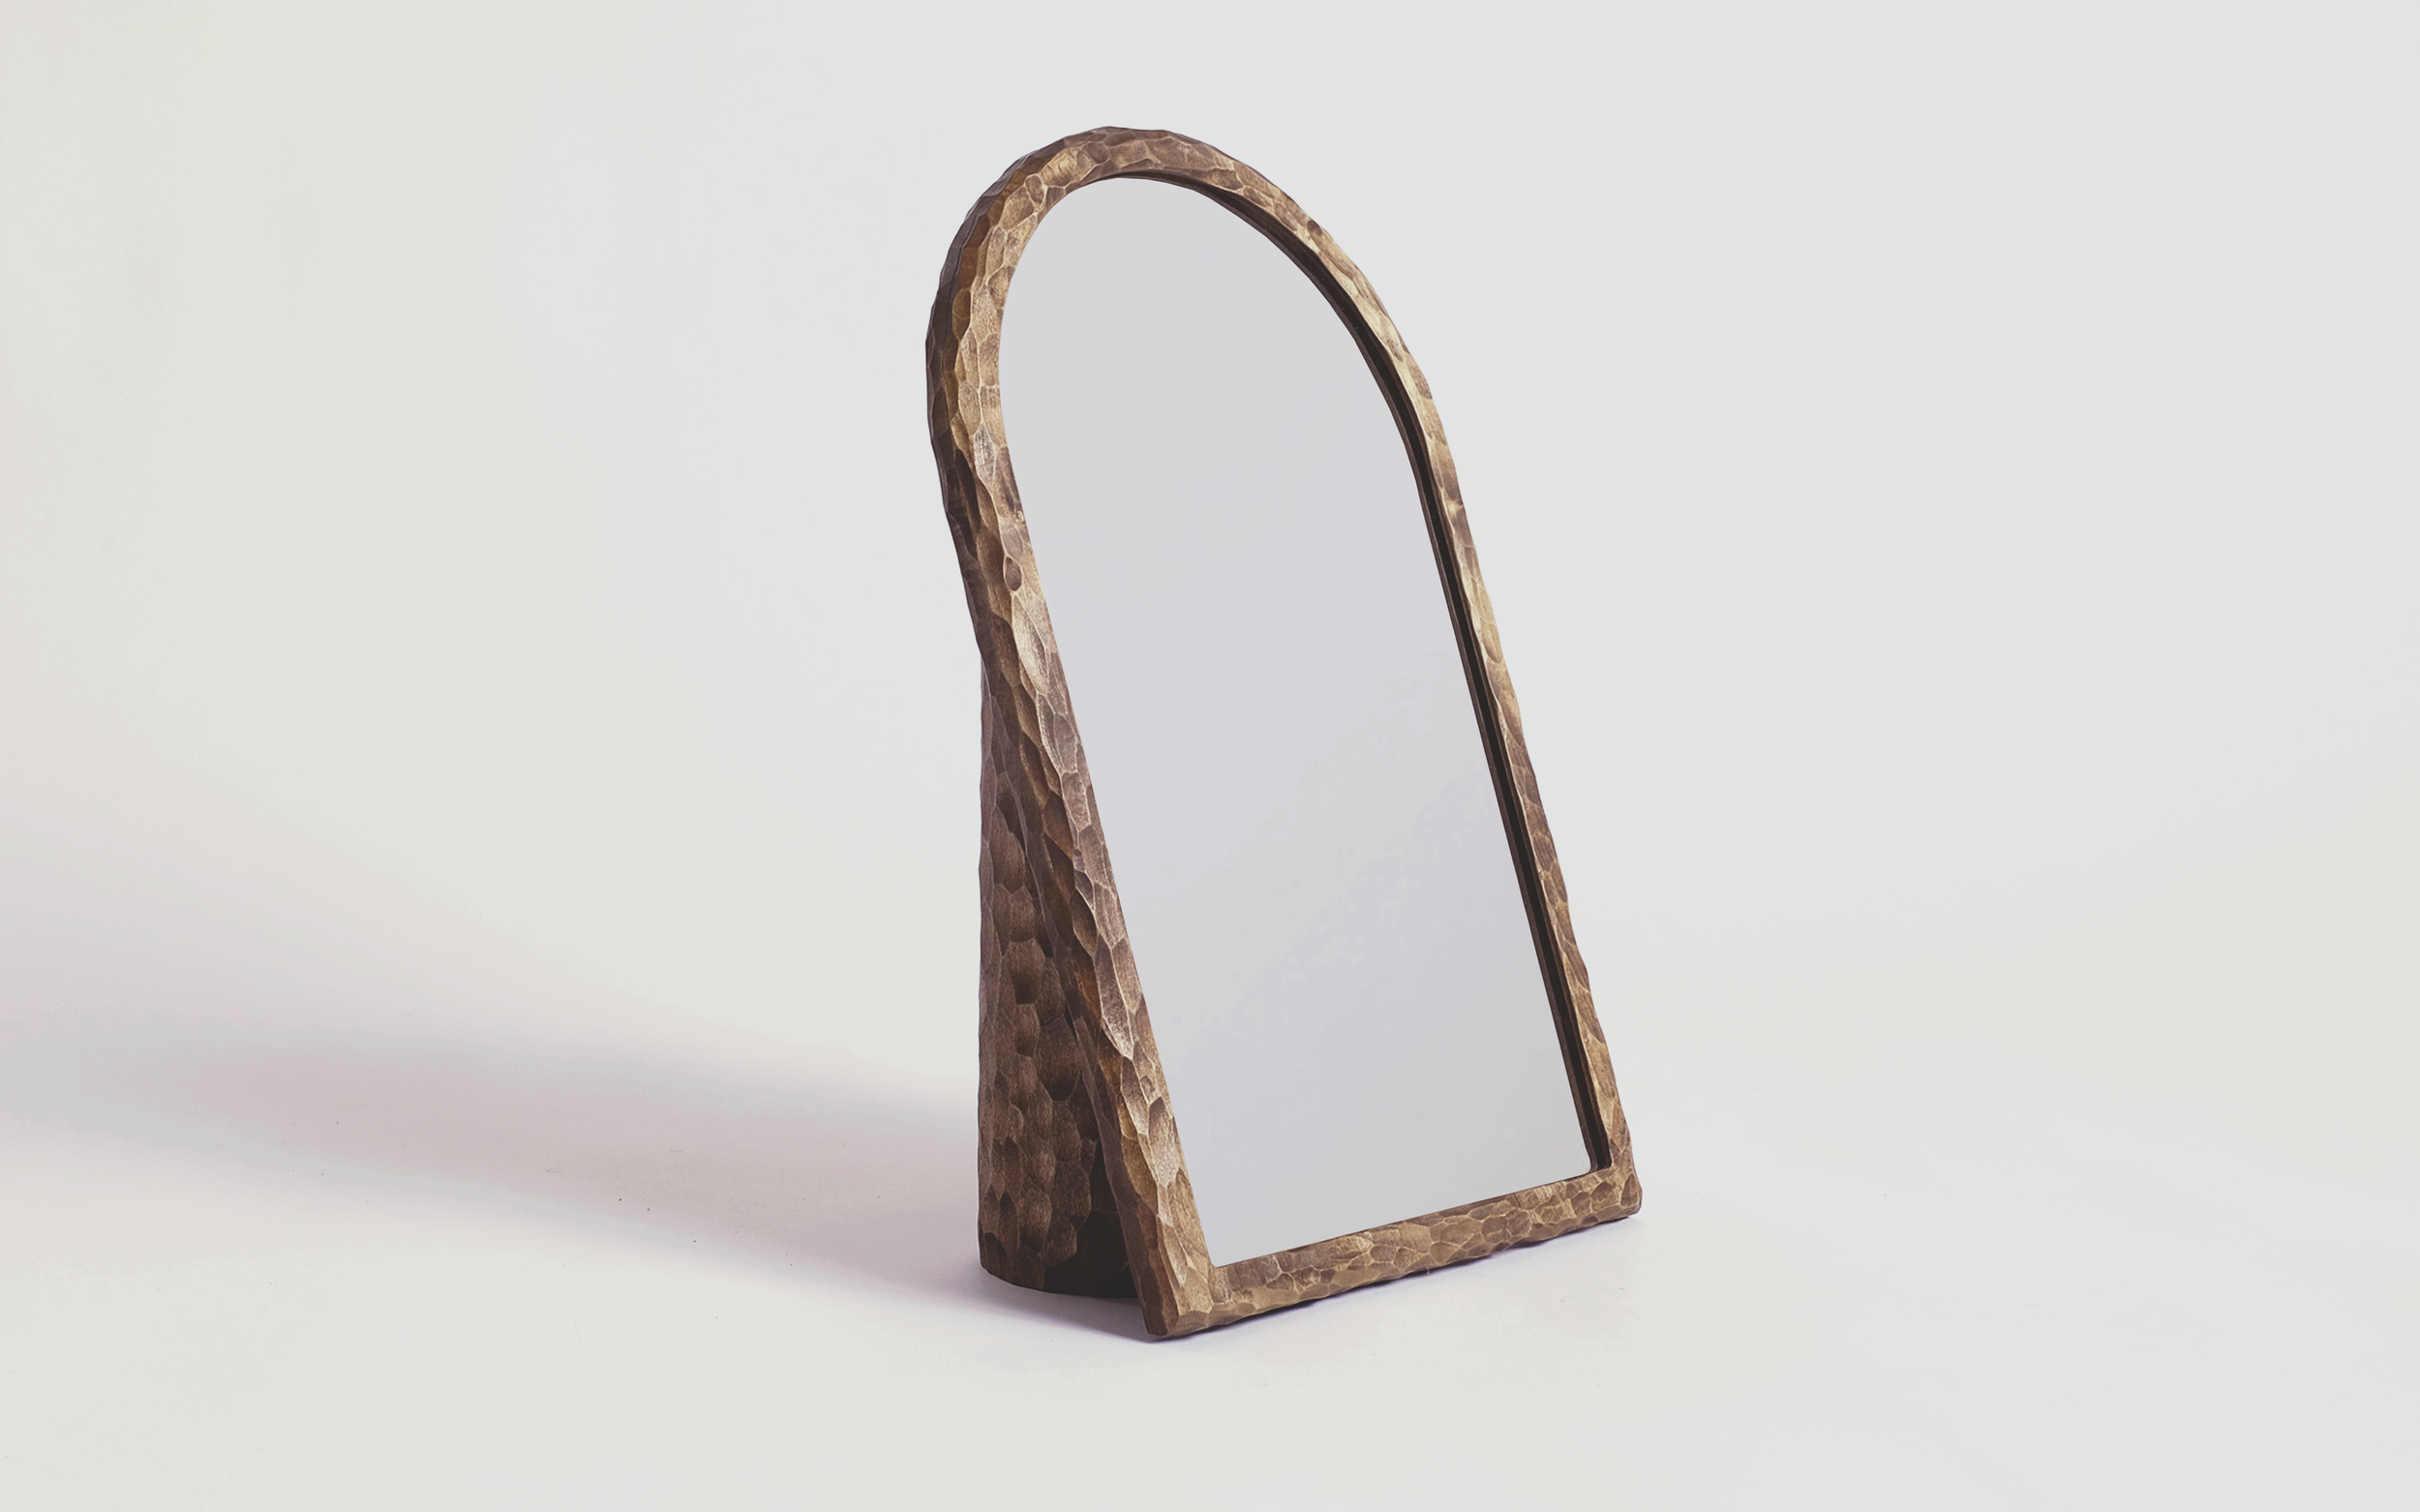 02_StudioAnansi_Chisel-Mirror_Front_2018.png